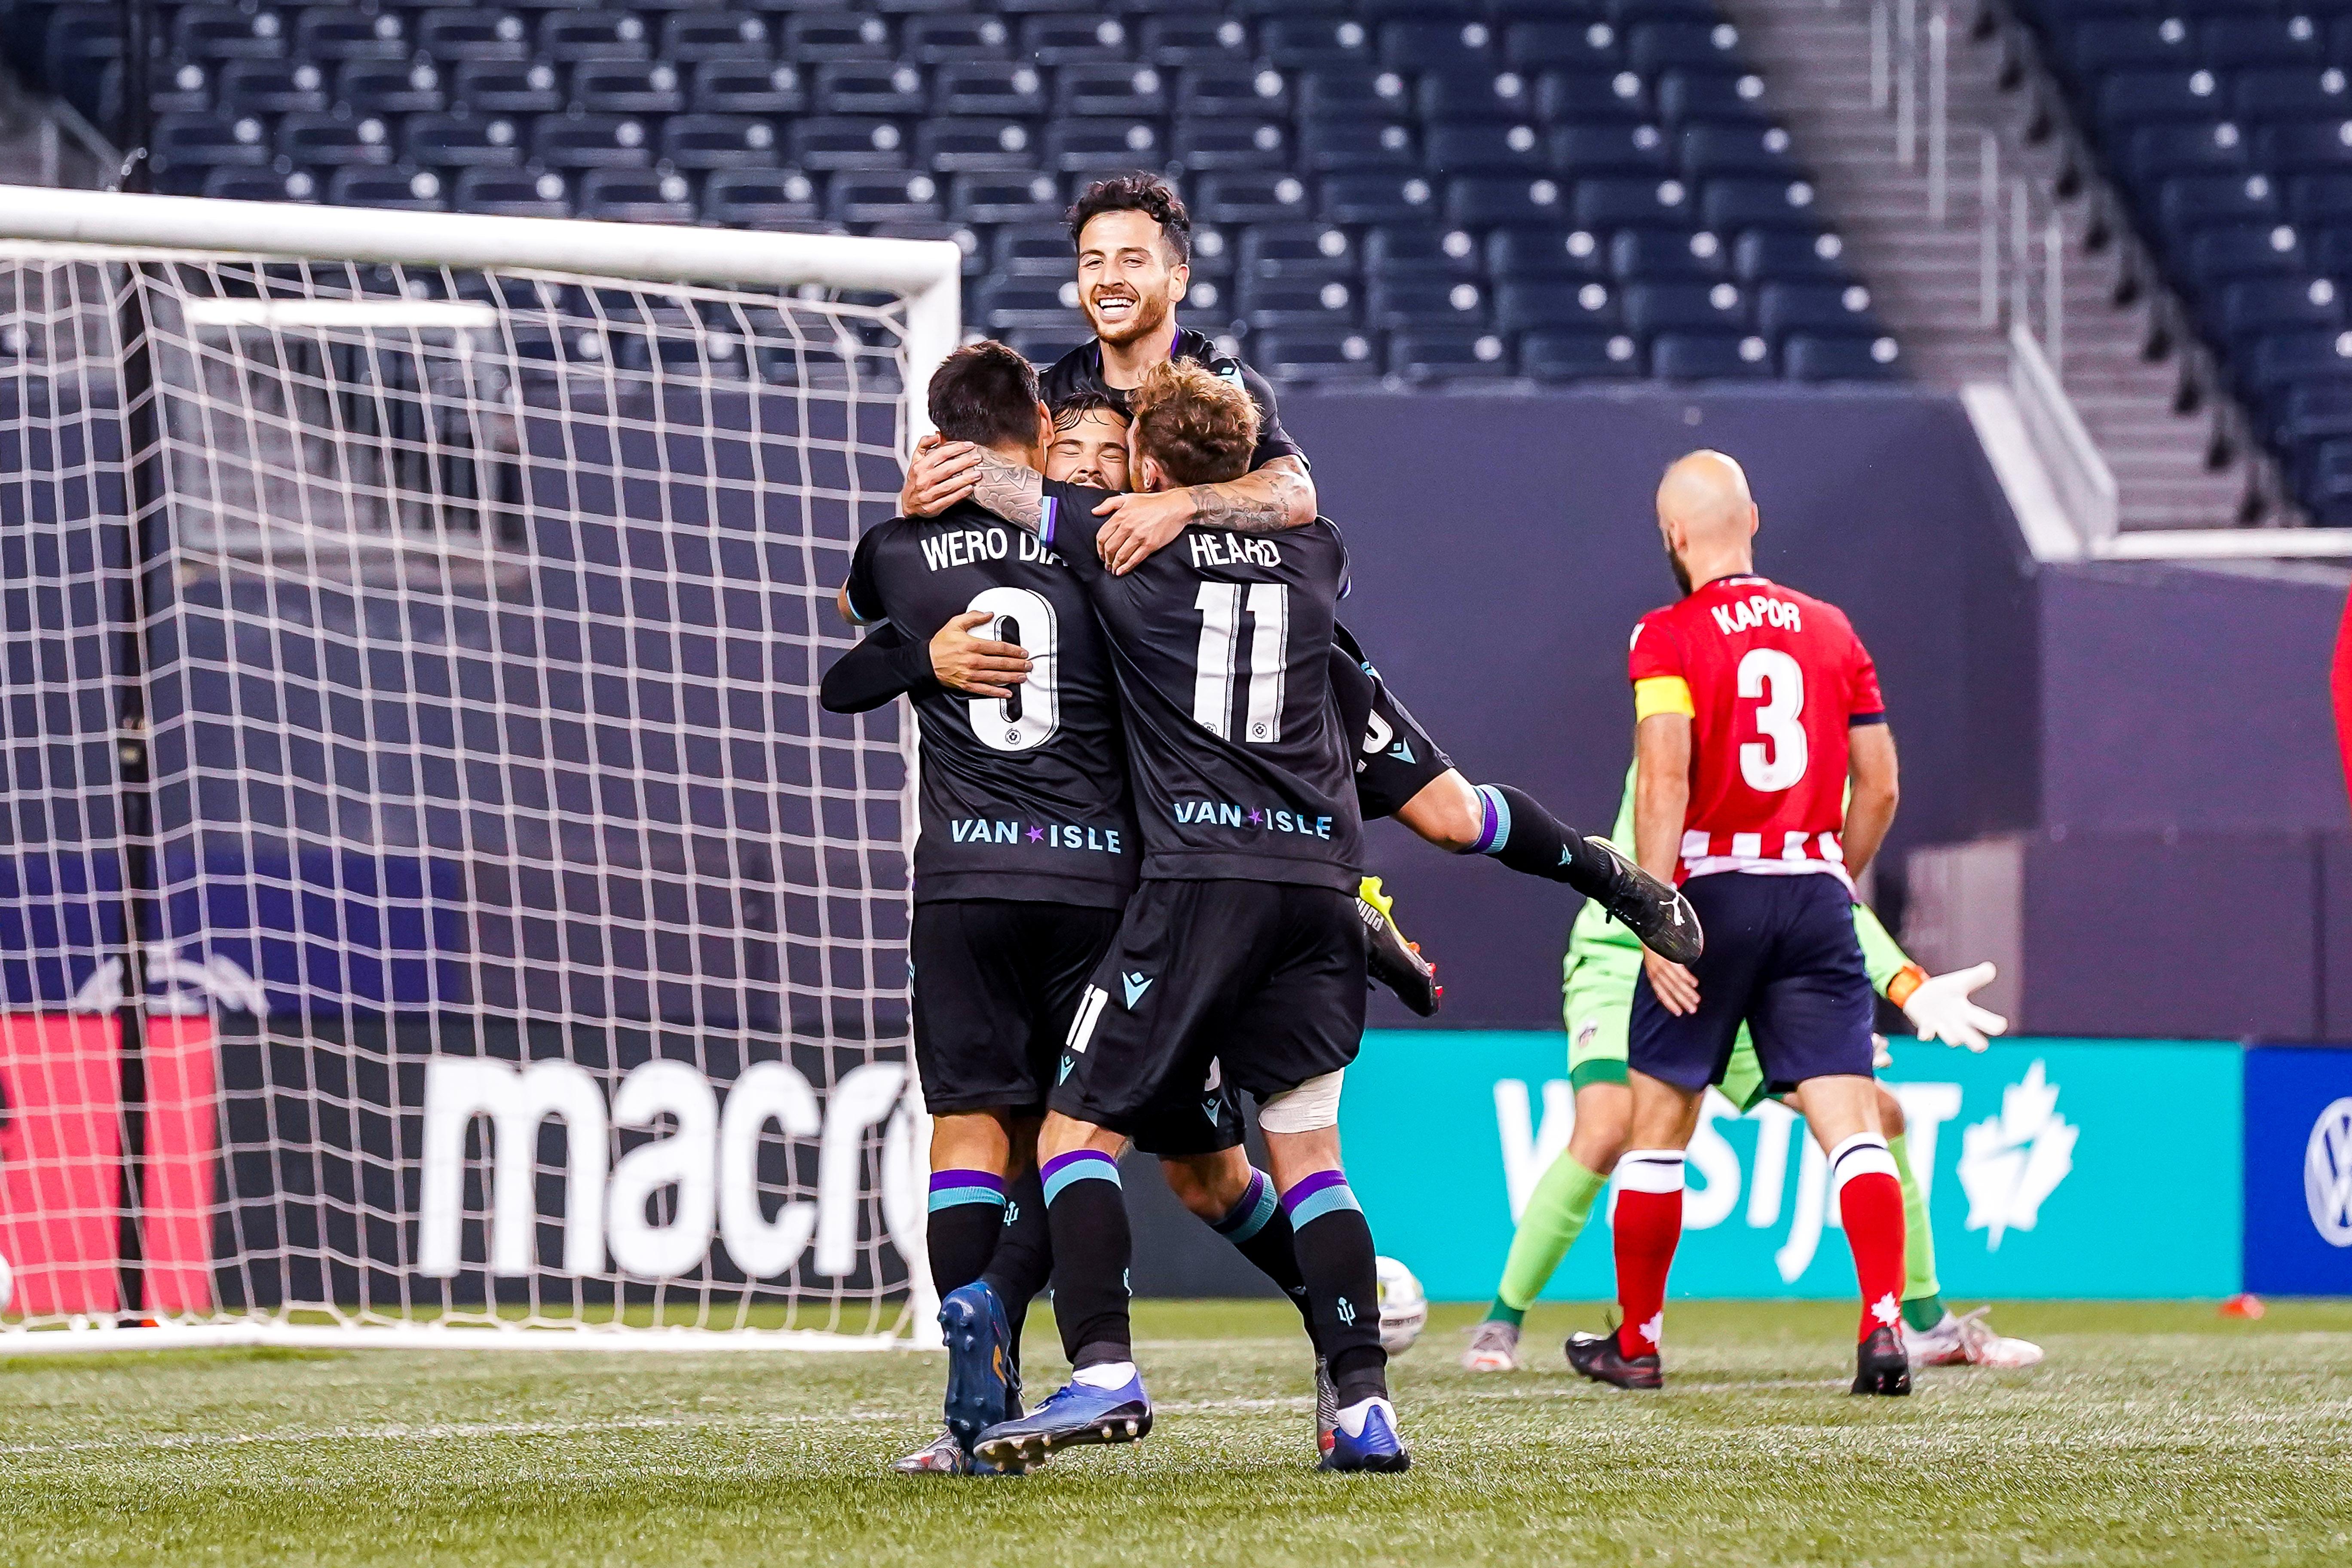 July 21, 2021. Pacific FC vs Atlético Ottawa. Second-Half. Pacific FC players embrace Alejandro Díaz following his hat-trick goal against Atlético Ottawa.